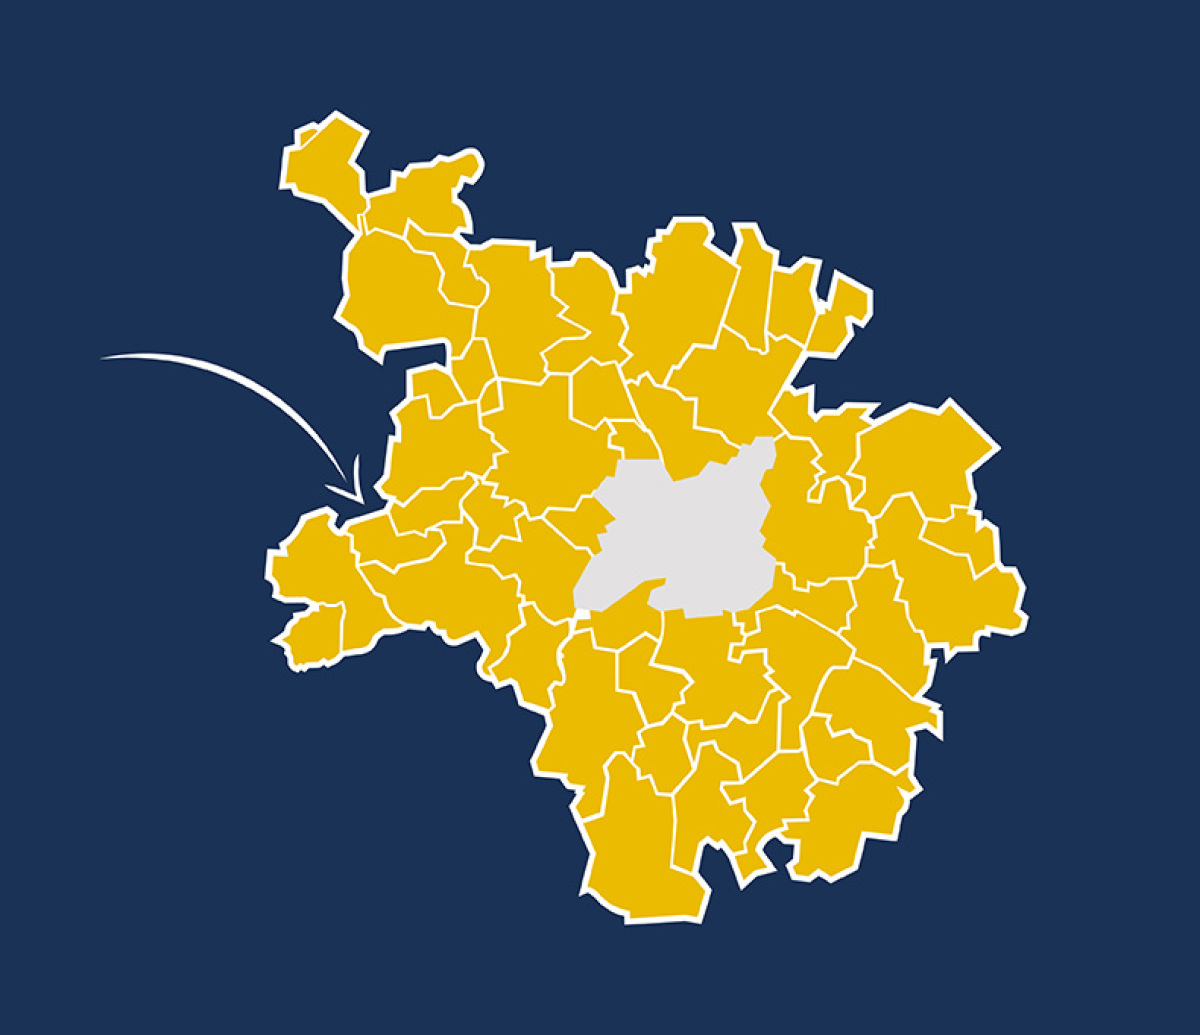 investissement immobilier neuf rennes - Tout l'immobilier neuf en périphérie de Rennes